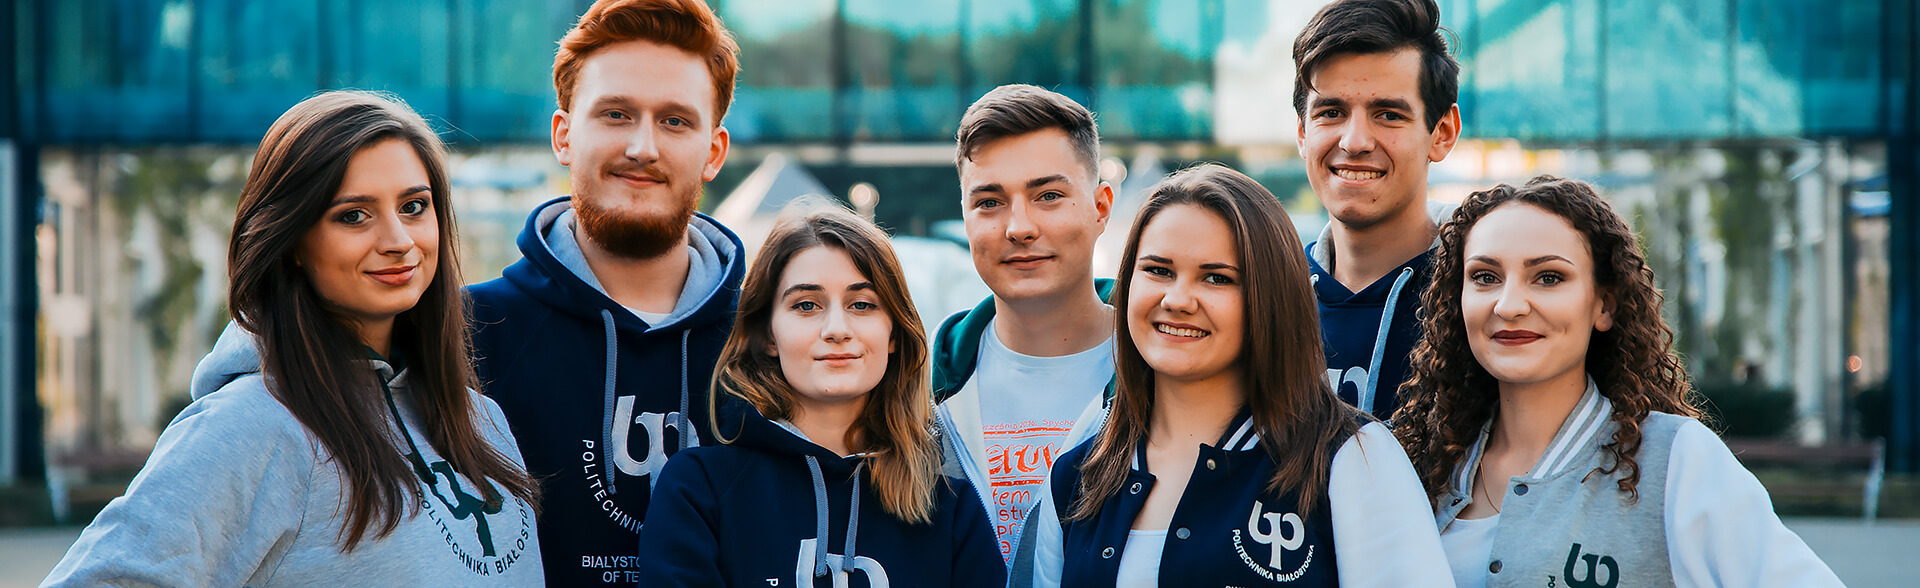 studenci Politechniki Białostockiej